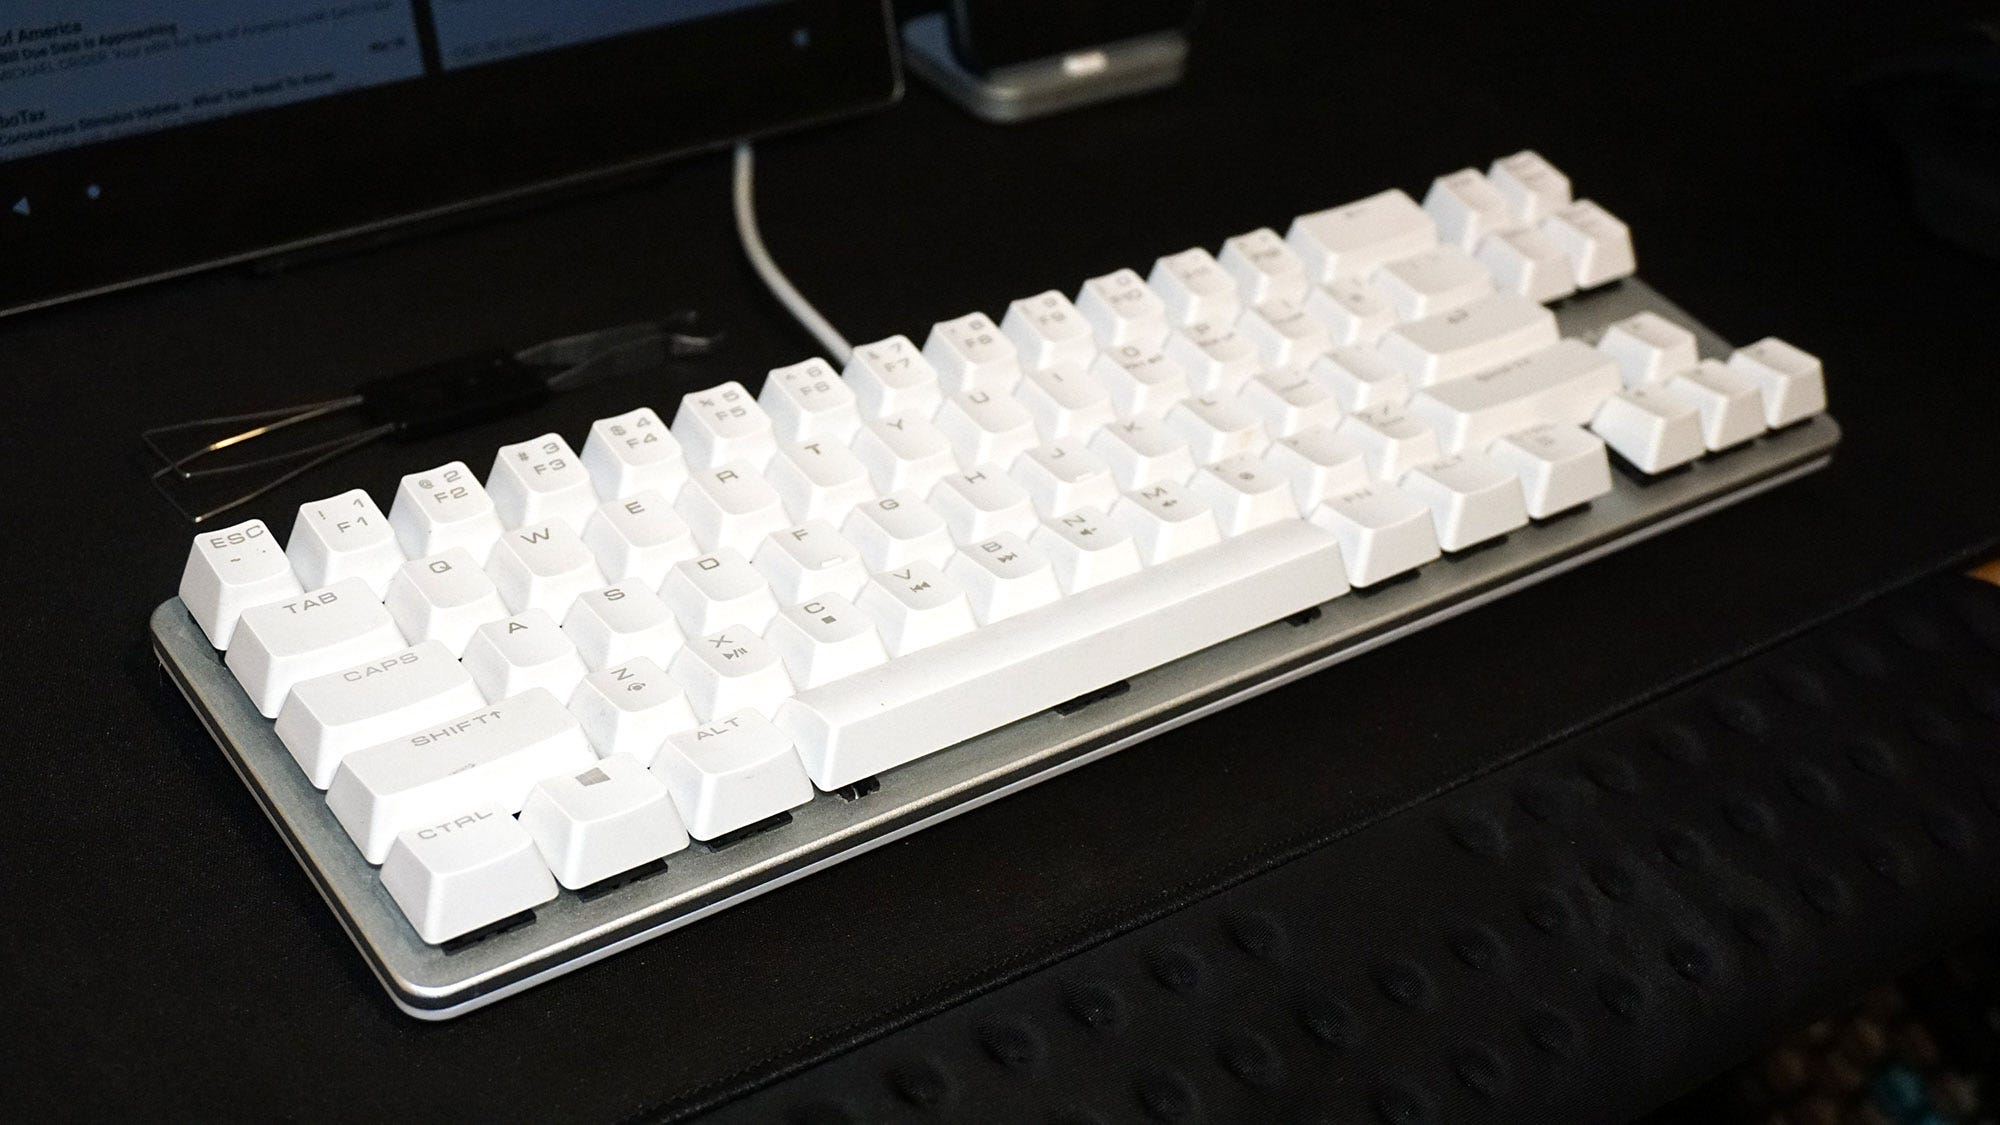 Magicforce keyboard.